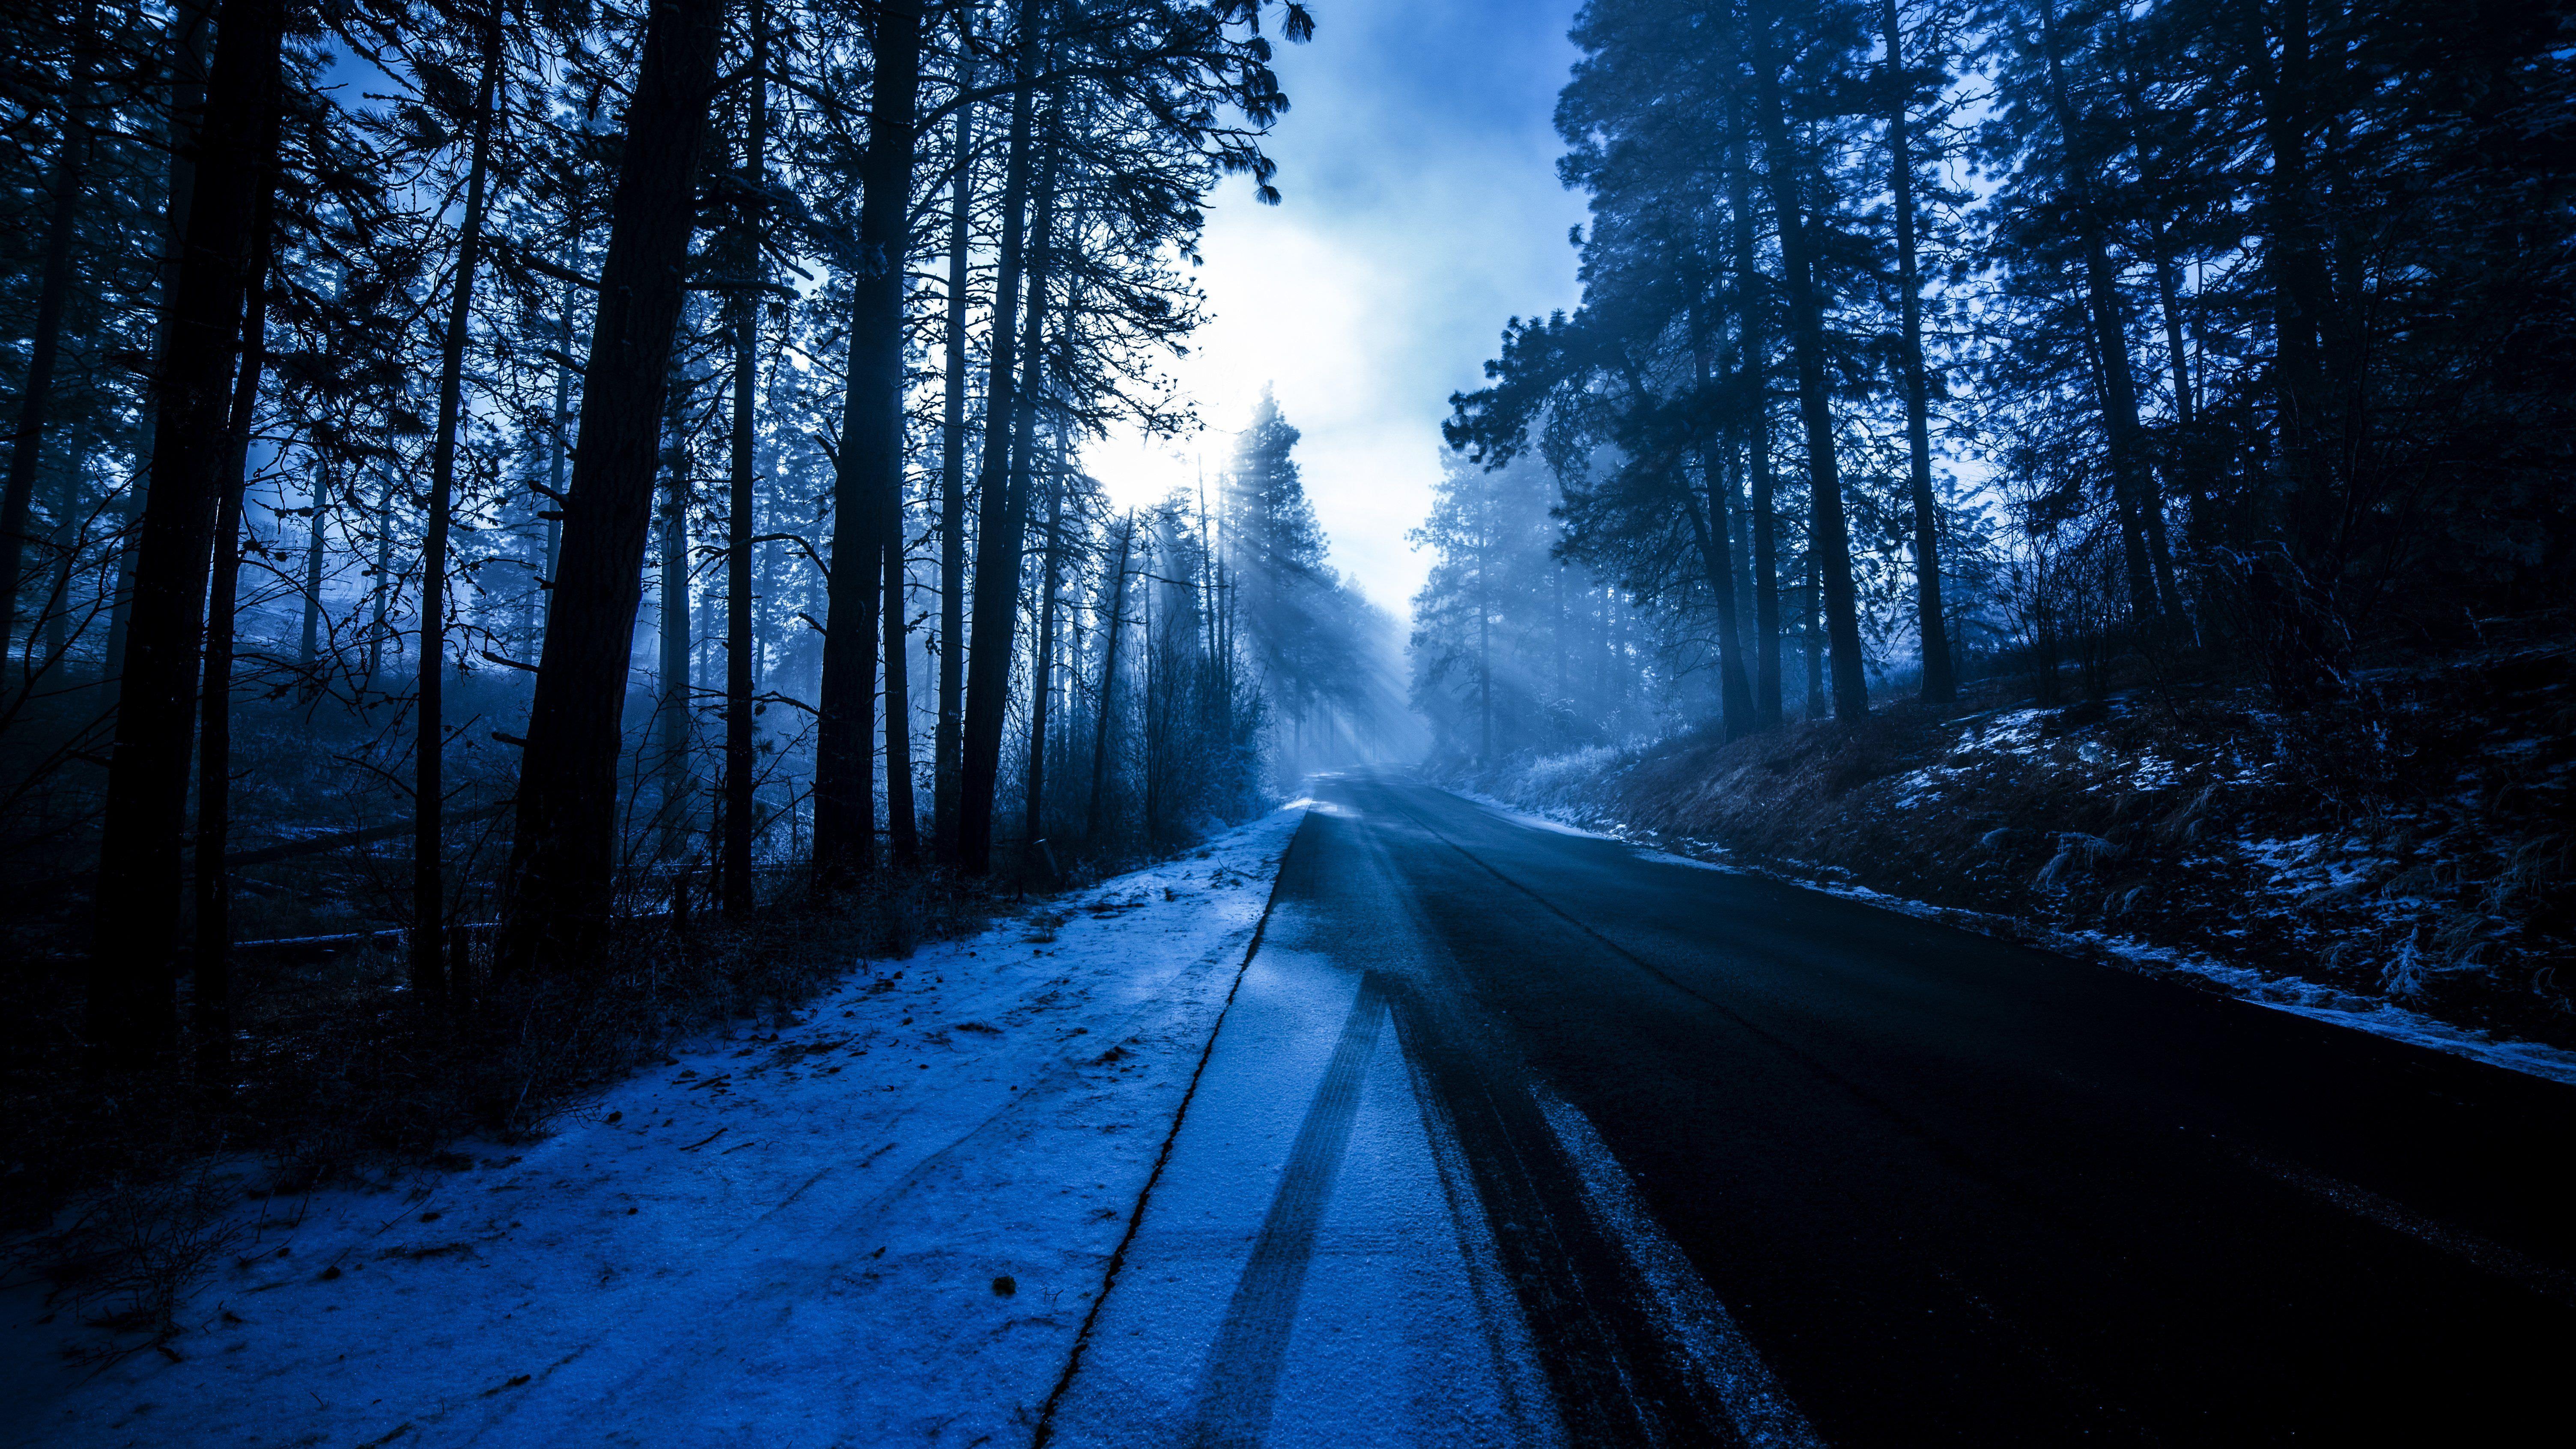 forest snowy dark evening 1574939514 - Forest Snowy Dark Evening -